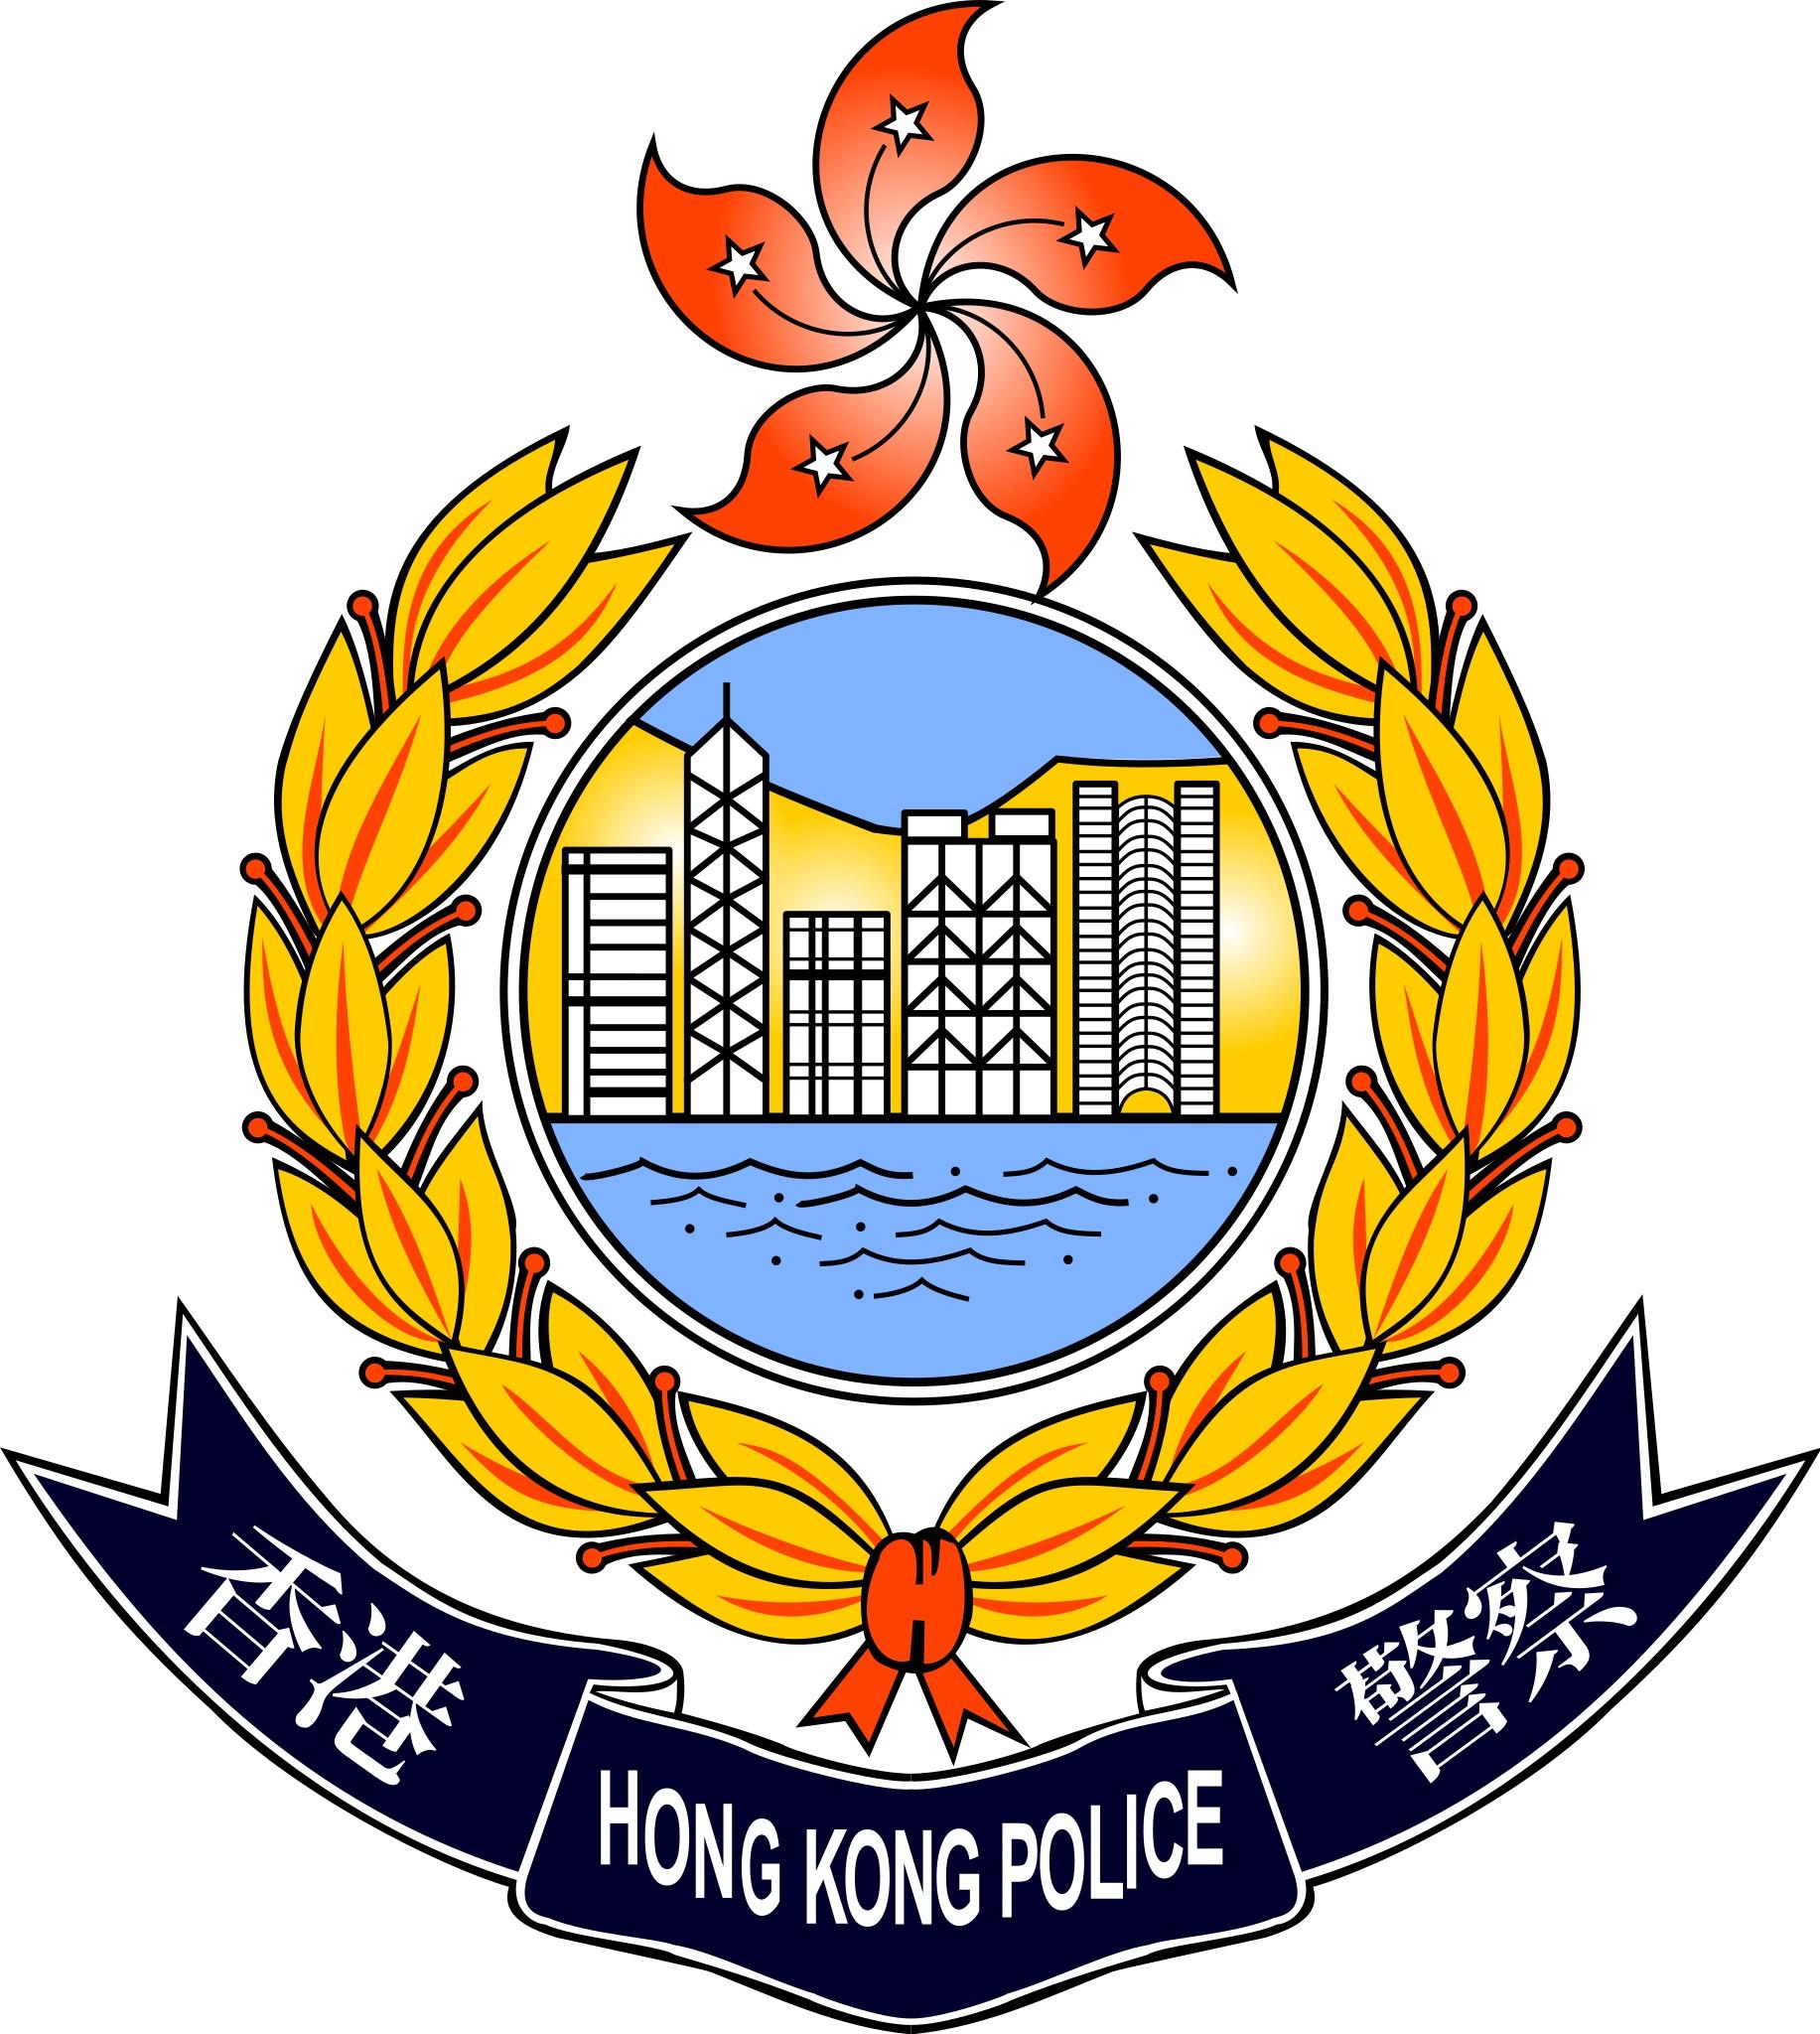 File:HKP logo.jpg